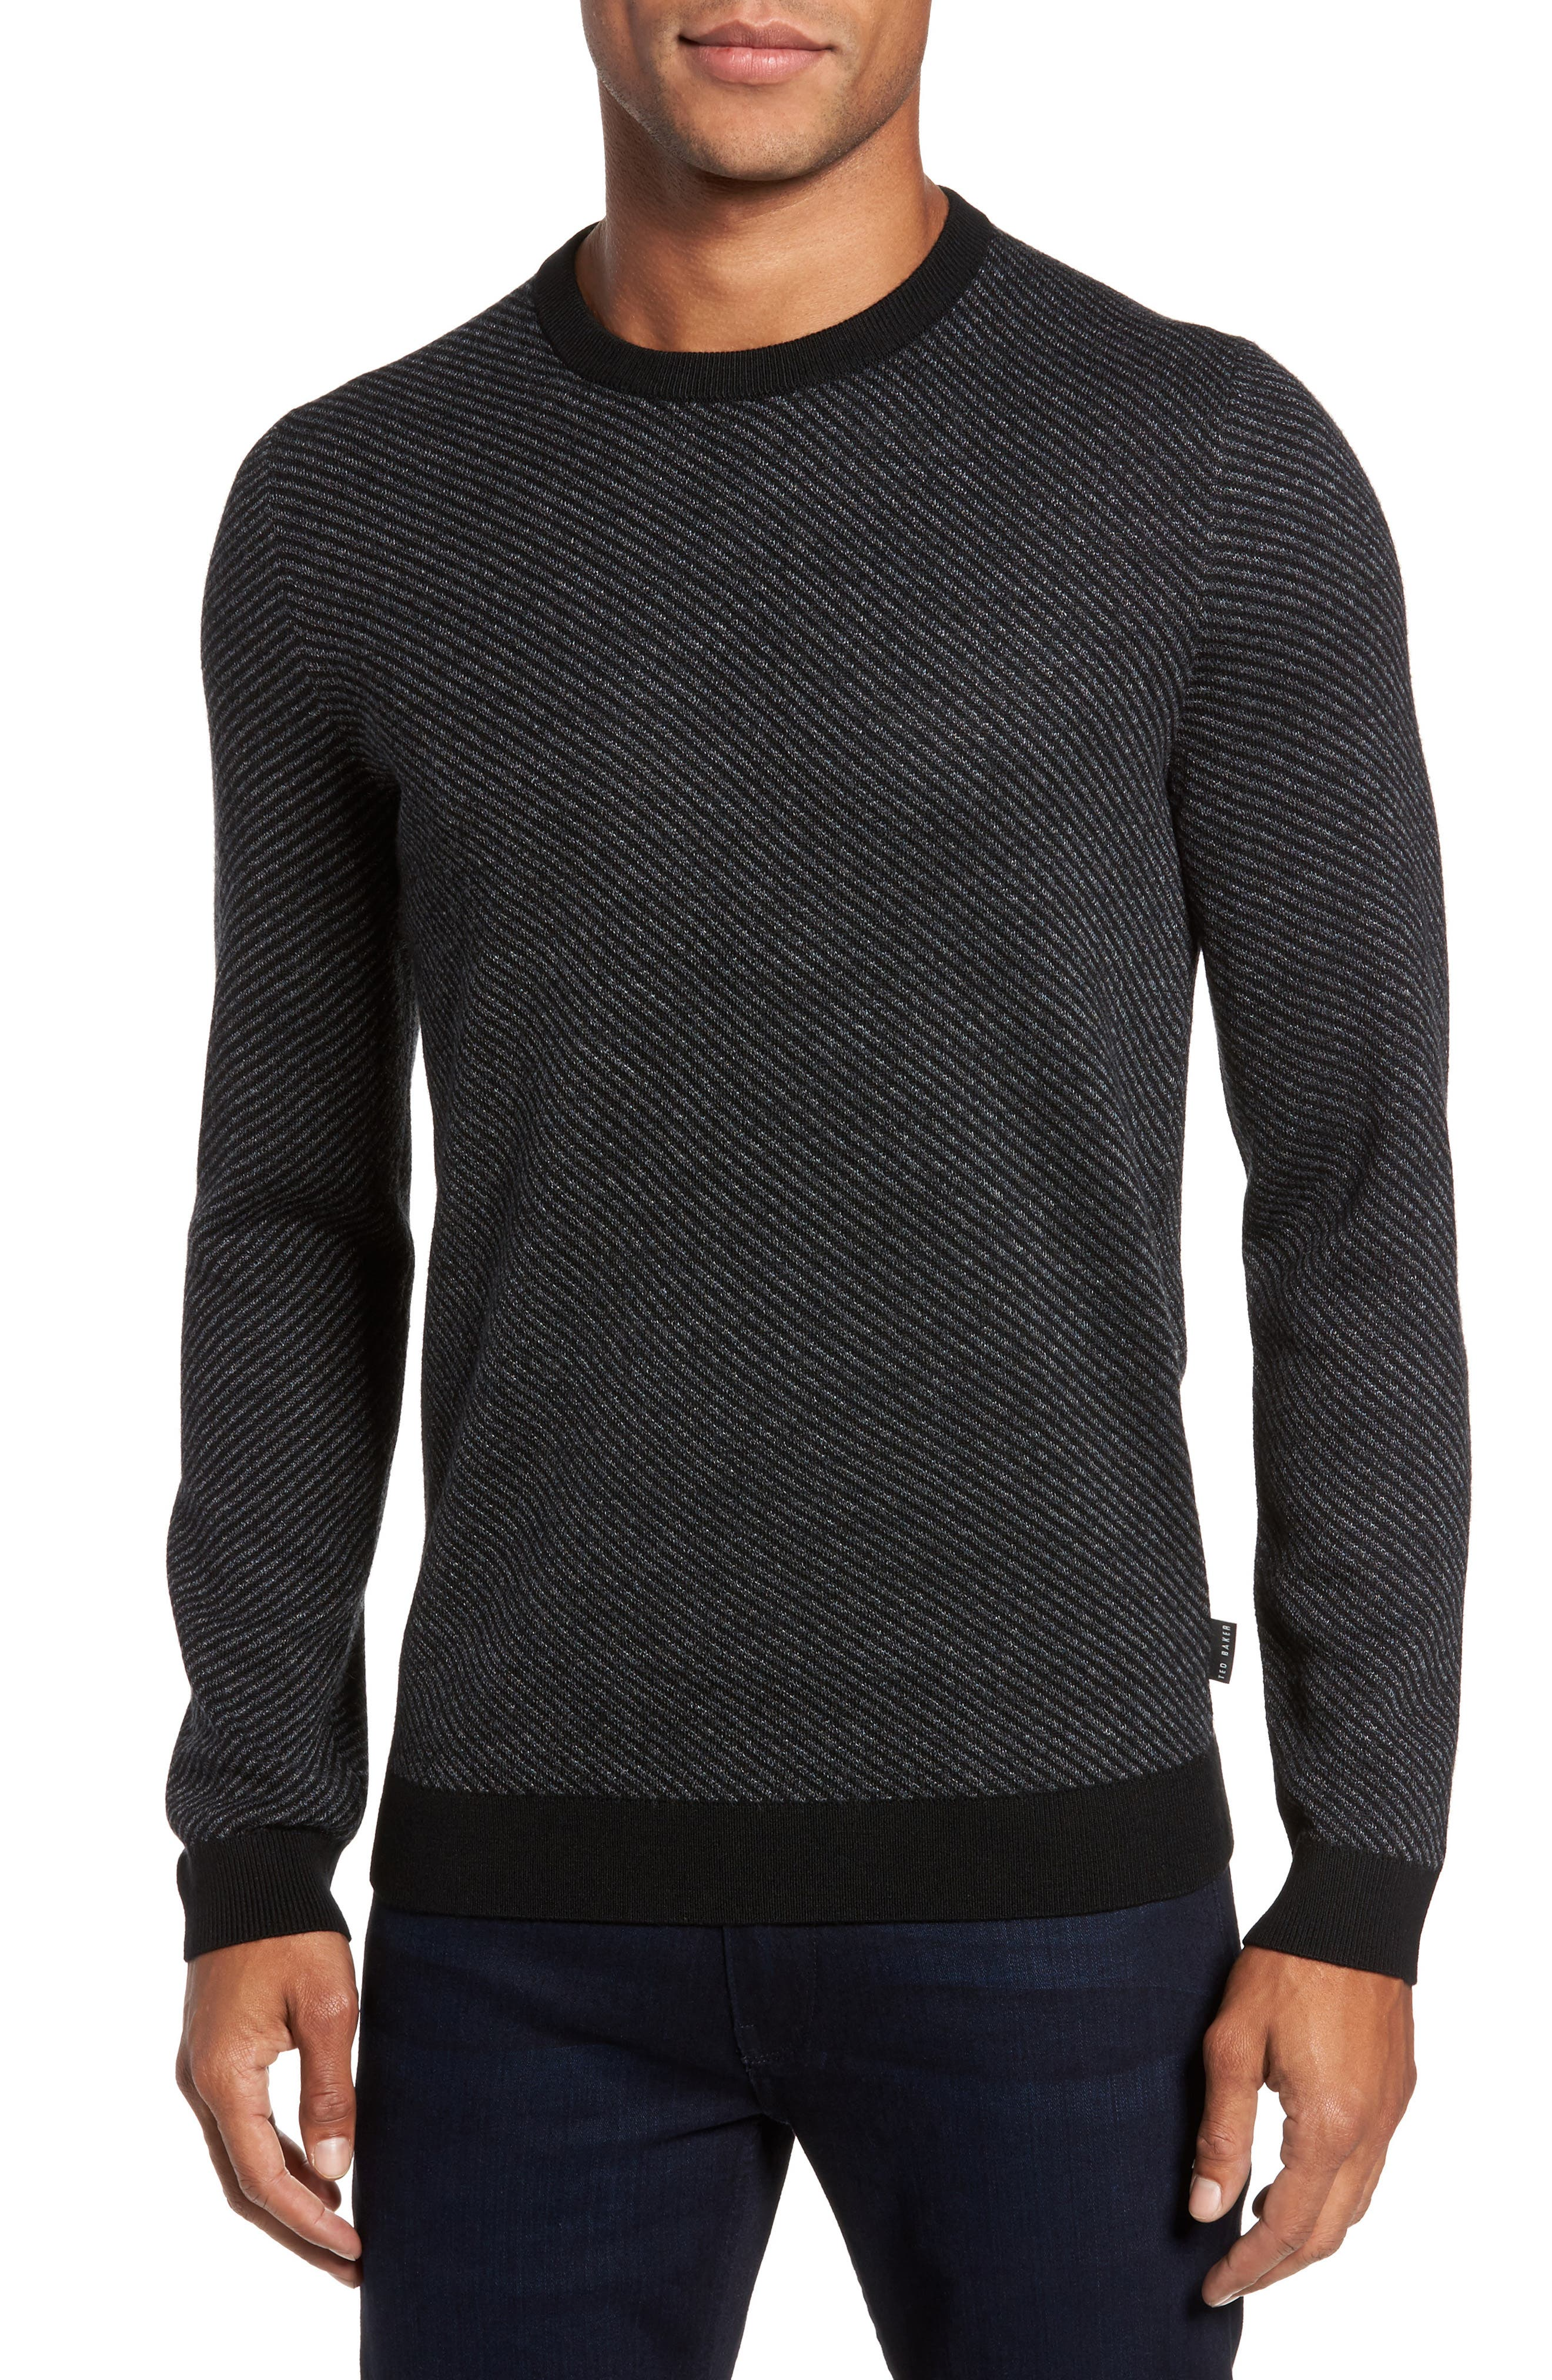 Alternate Image 1 Selected - Ted Baker London Cinamon Interest Stitch Crewneck Sweater